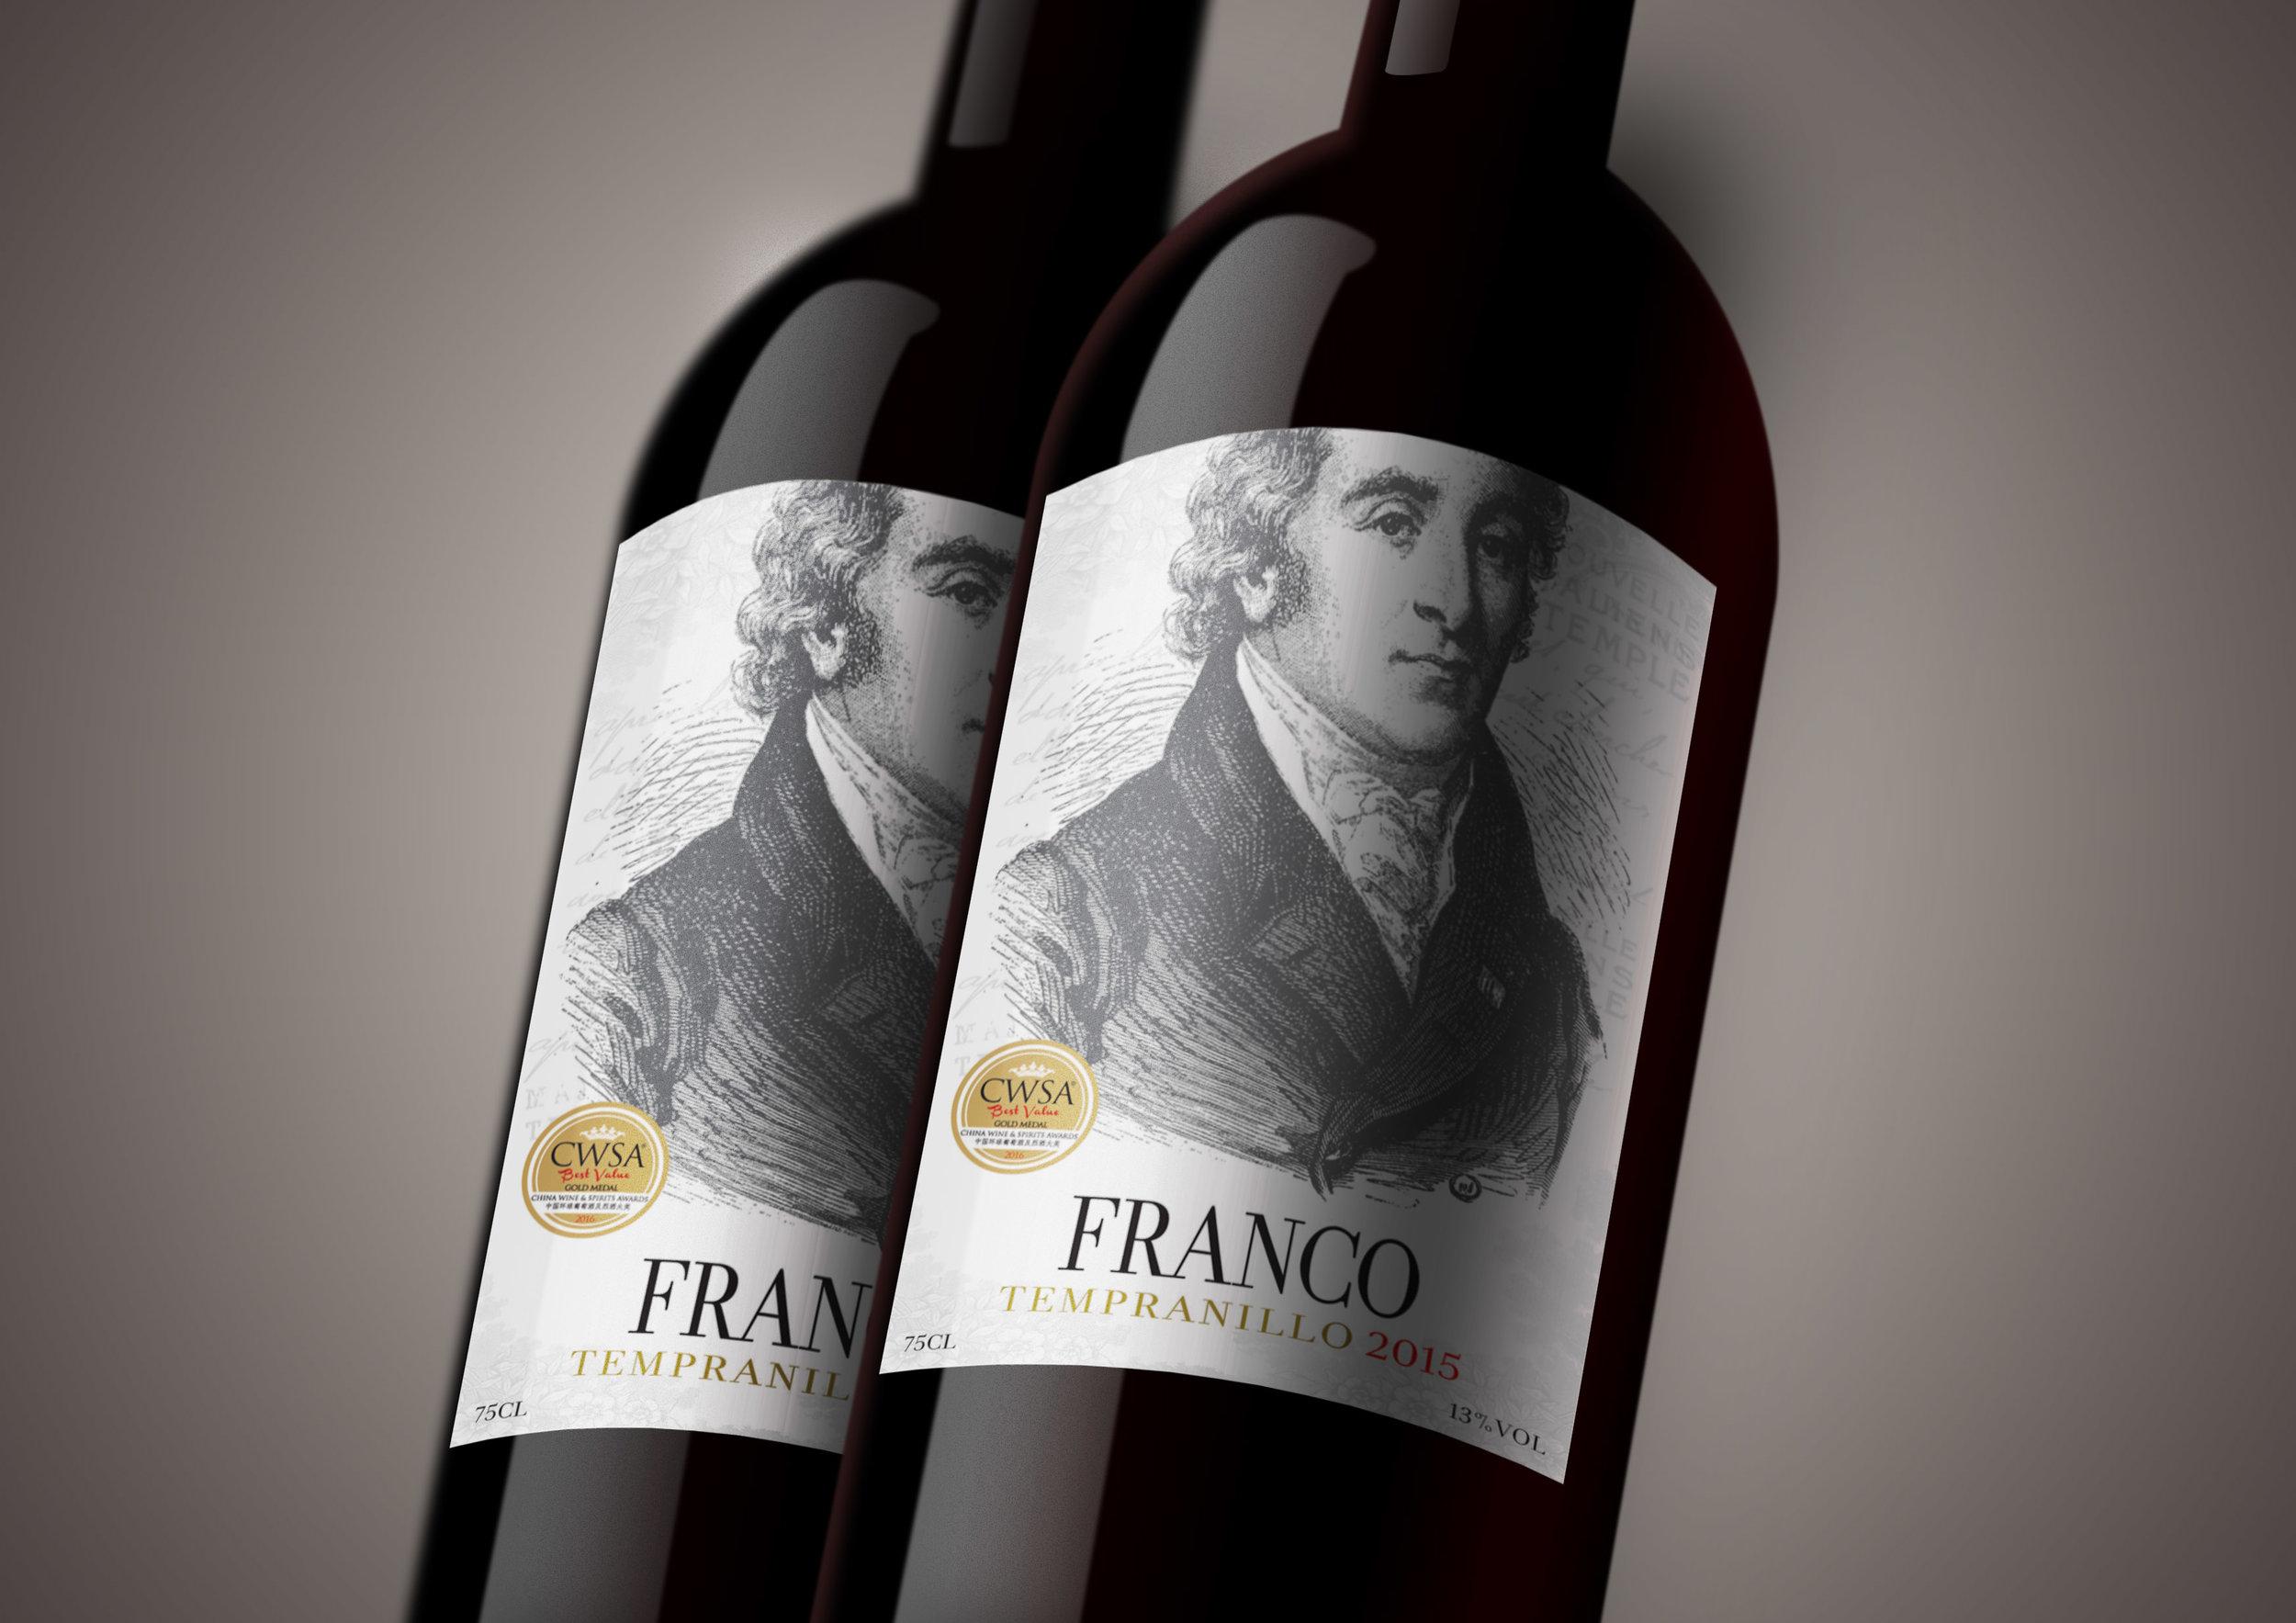 2 Bottle Mock Up Franco.jpg